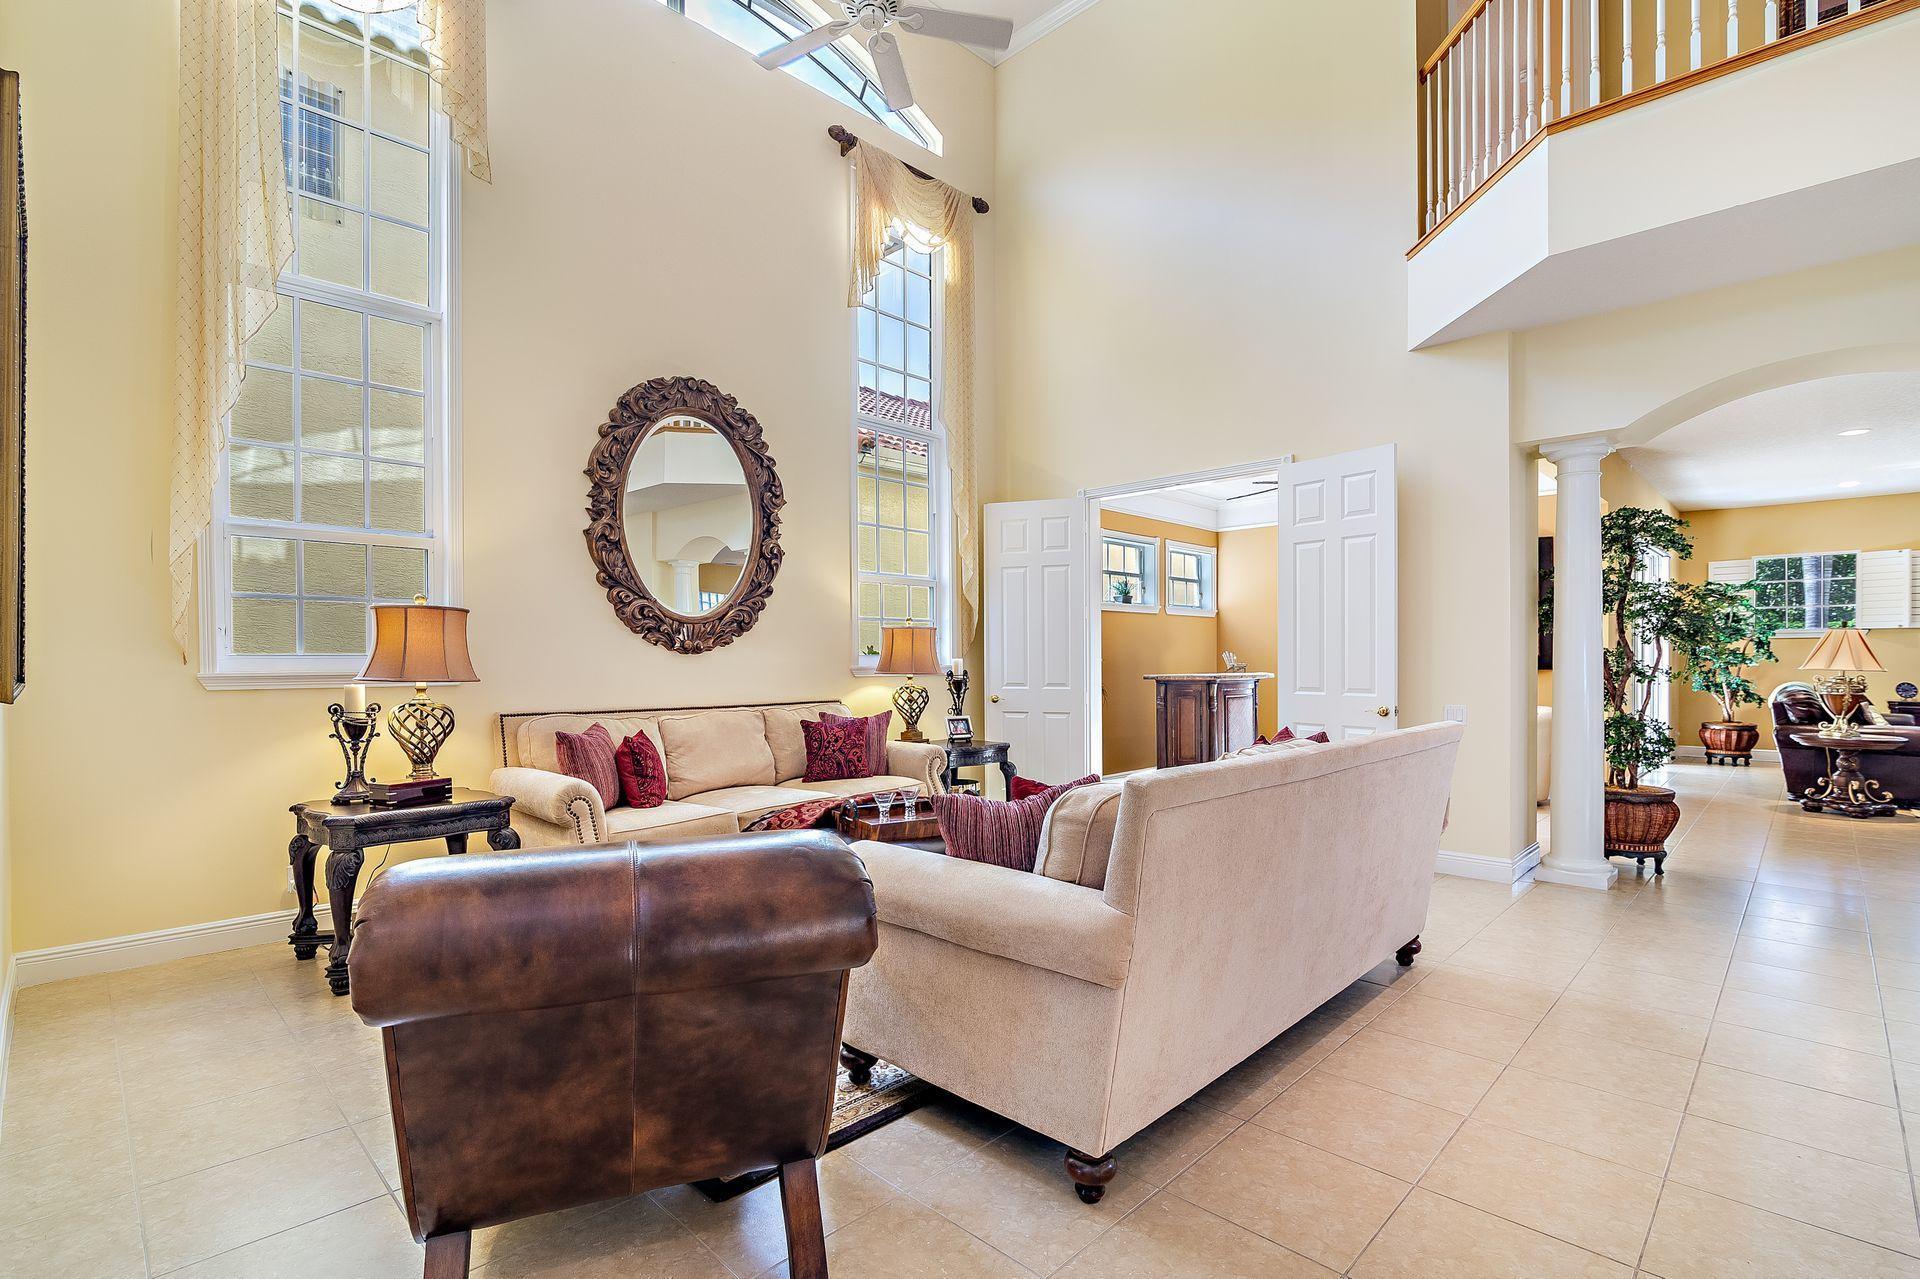 702 Voyager Lane, North Palm Beach, Florida 33410, 5 Bedrooms Bedrooms, ,4 BathroomsBathrooms,A,Single family,Voyager,RX-10464045